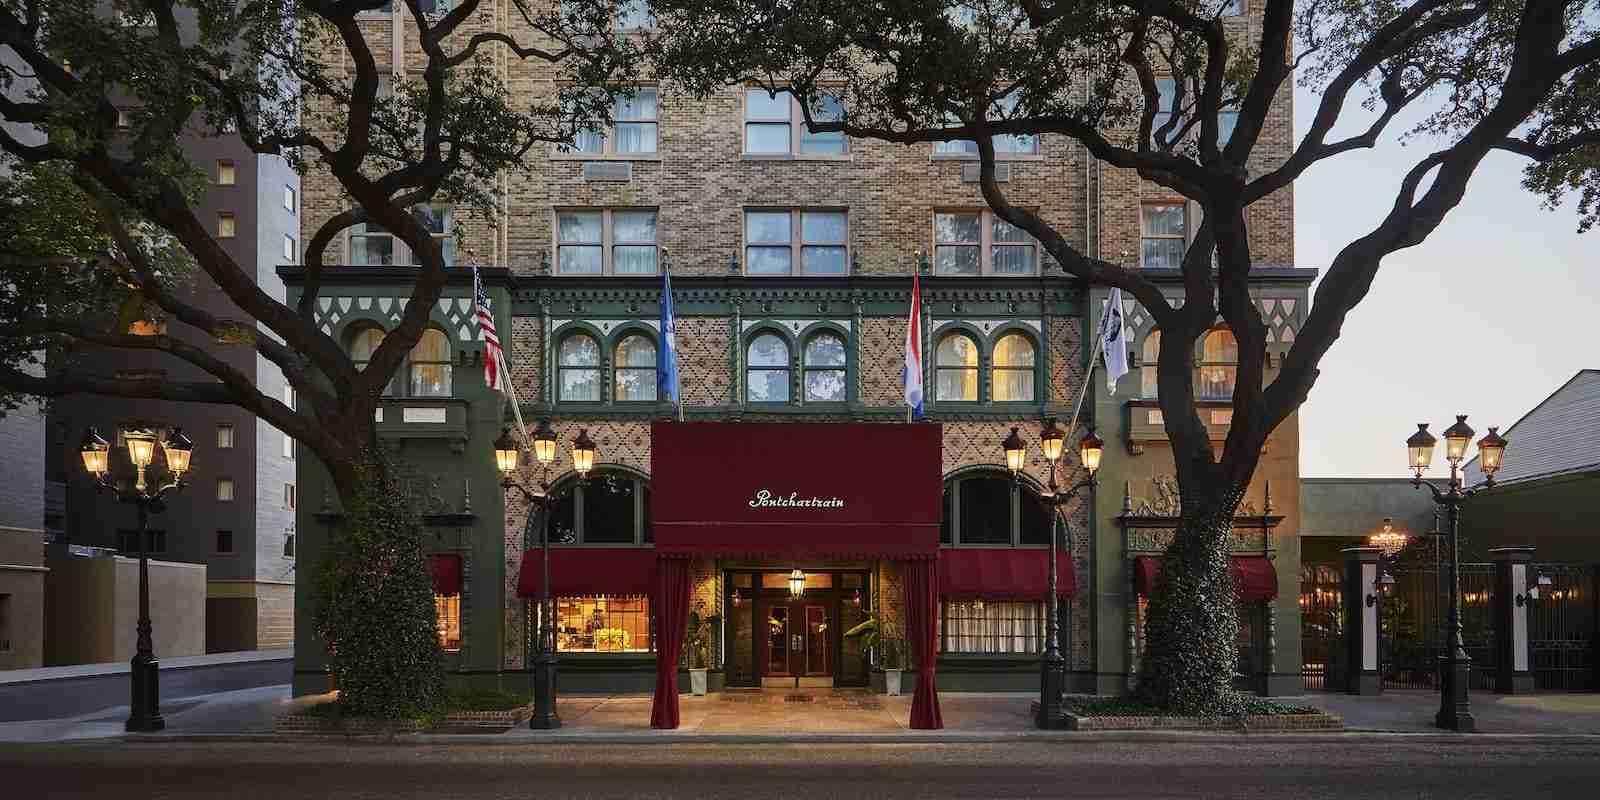 Louisiana hotels new Orleans